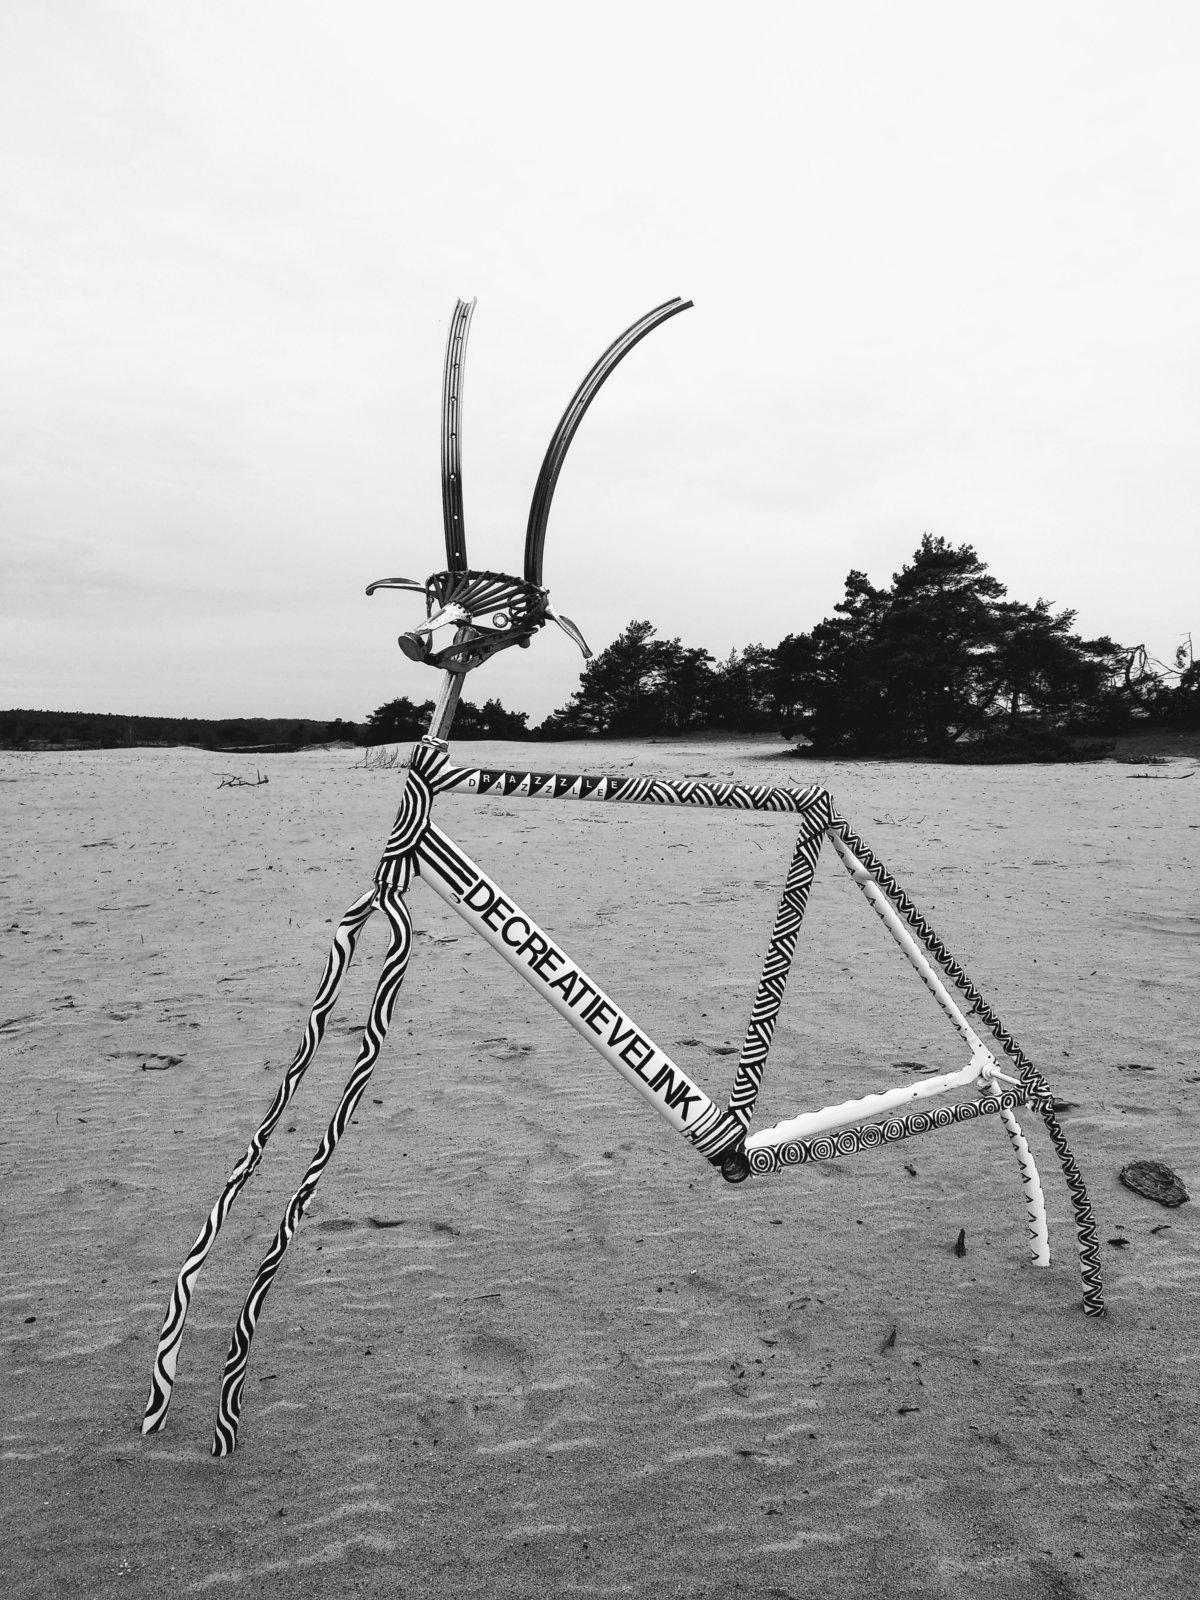 Animalized Razzle Dazzle Bicycle Art Fietskunst Decreatievelink